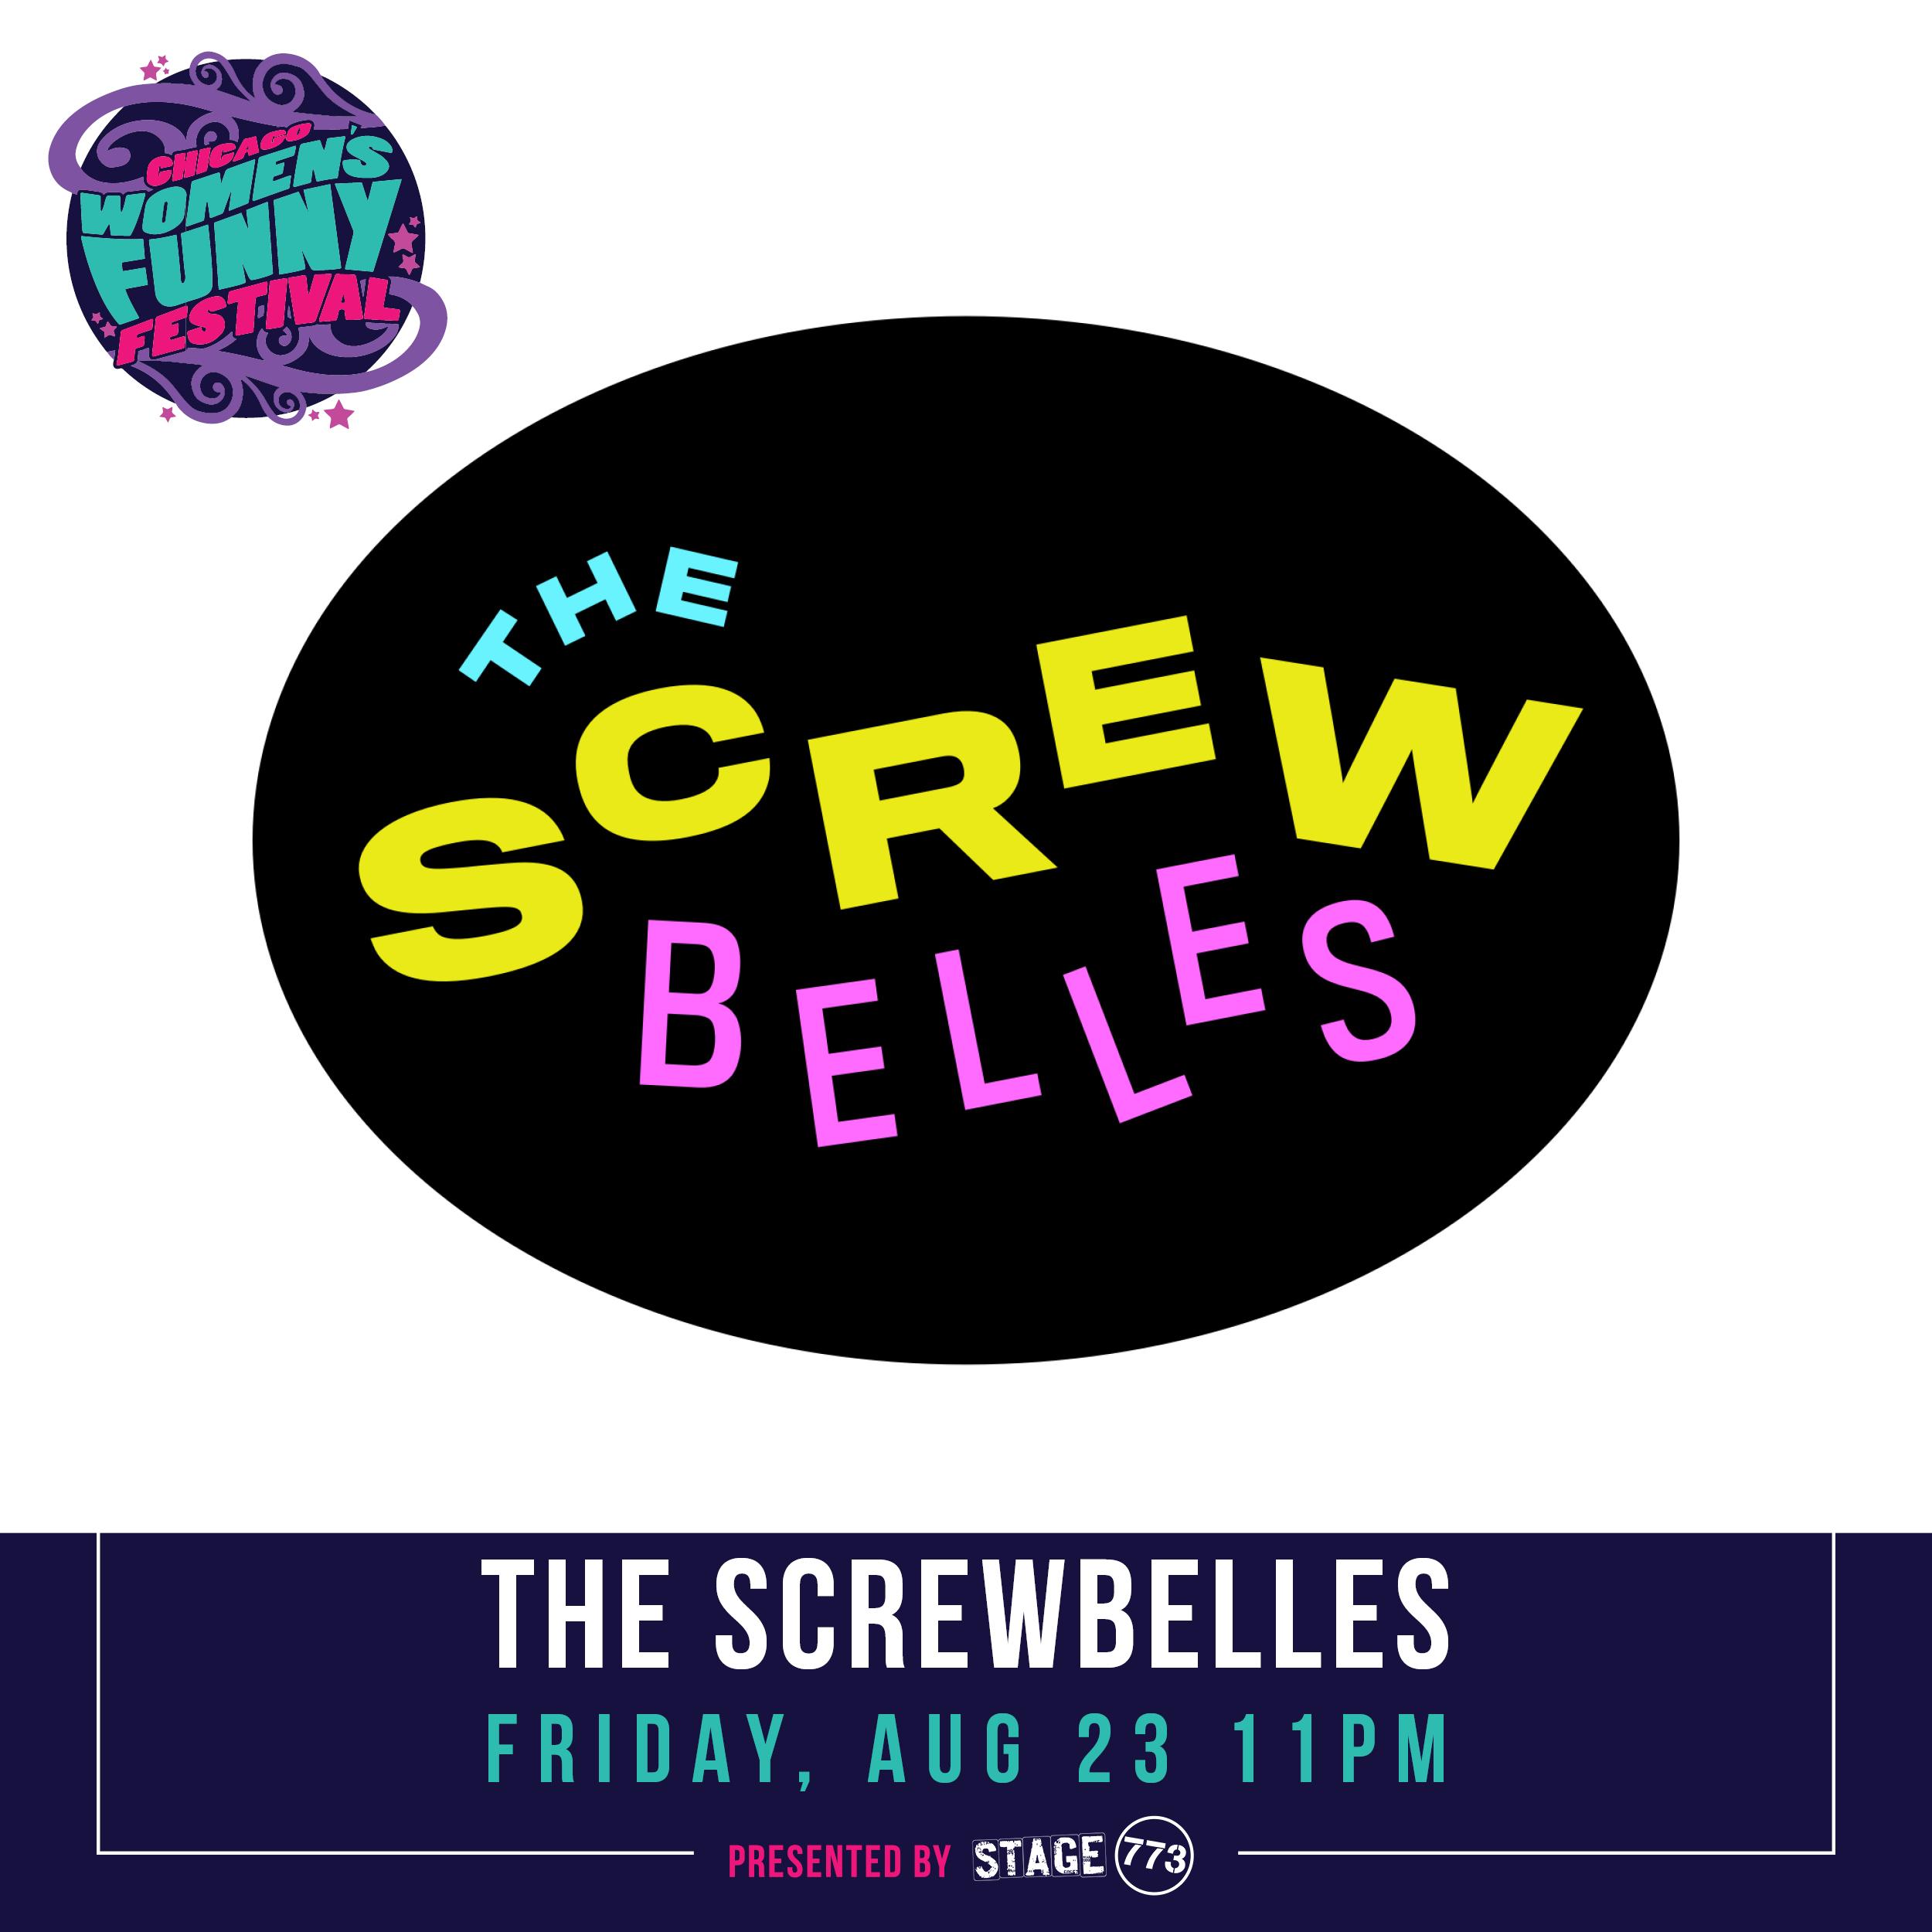 Screwbelles_Friday_11PM_CWFF20196.jpg